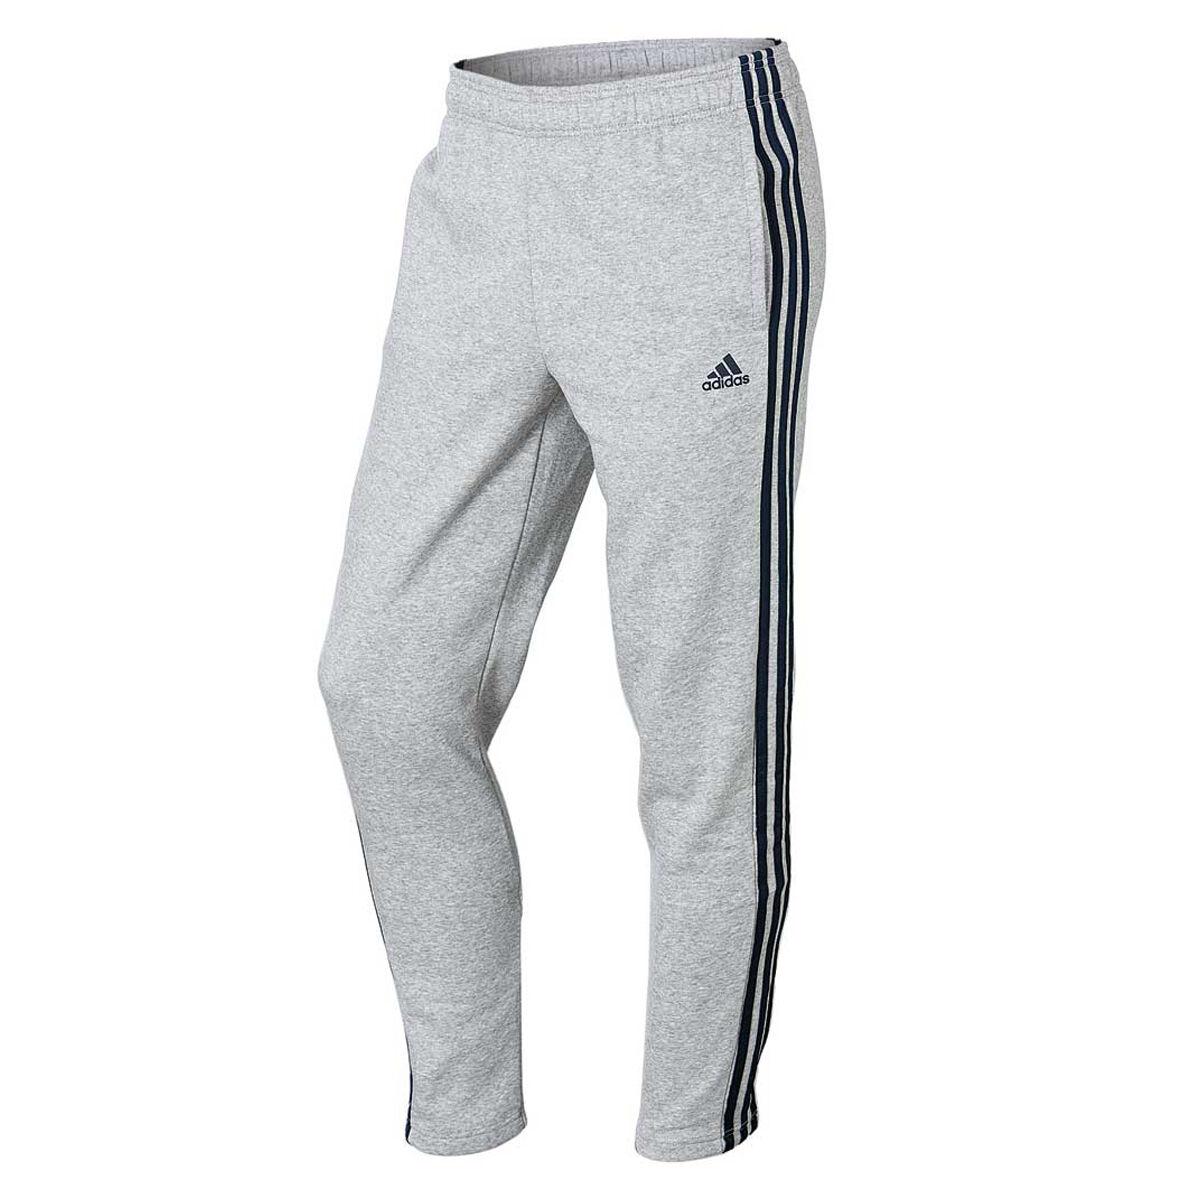 adidas Mens Essentials 3 Stripes Tapered Pants Grey Navy XXL